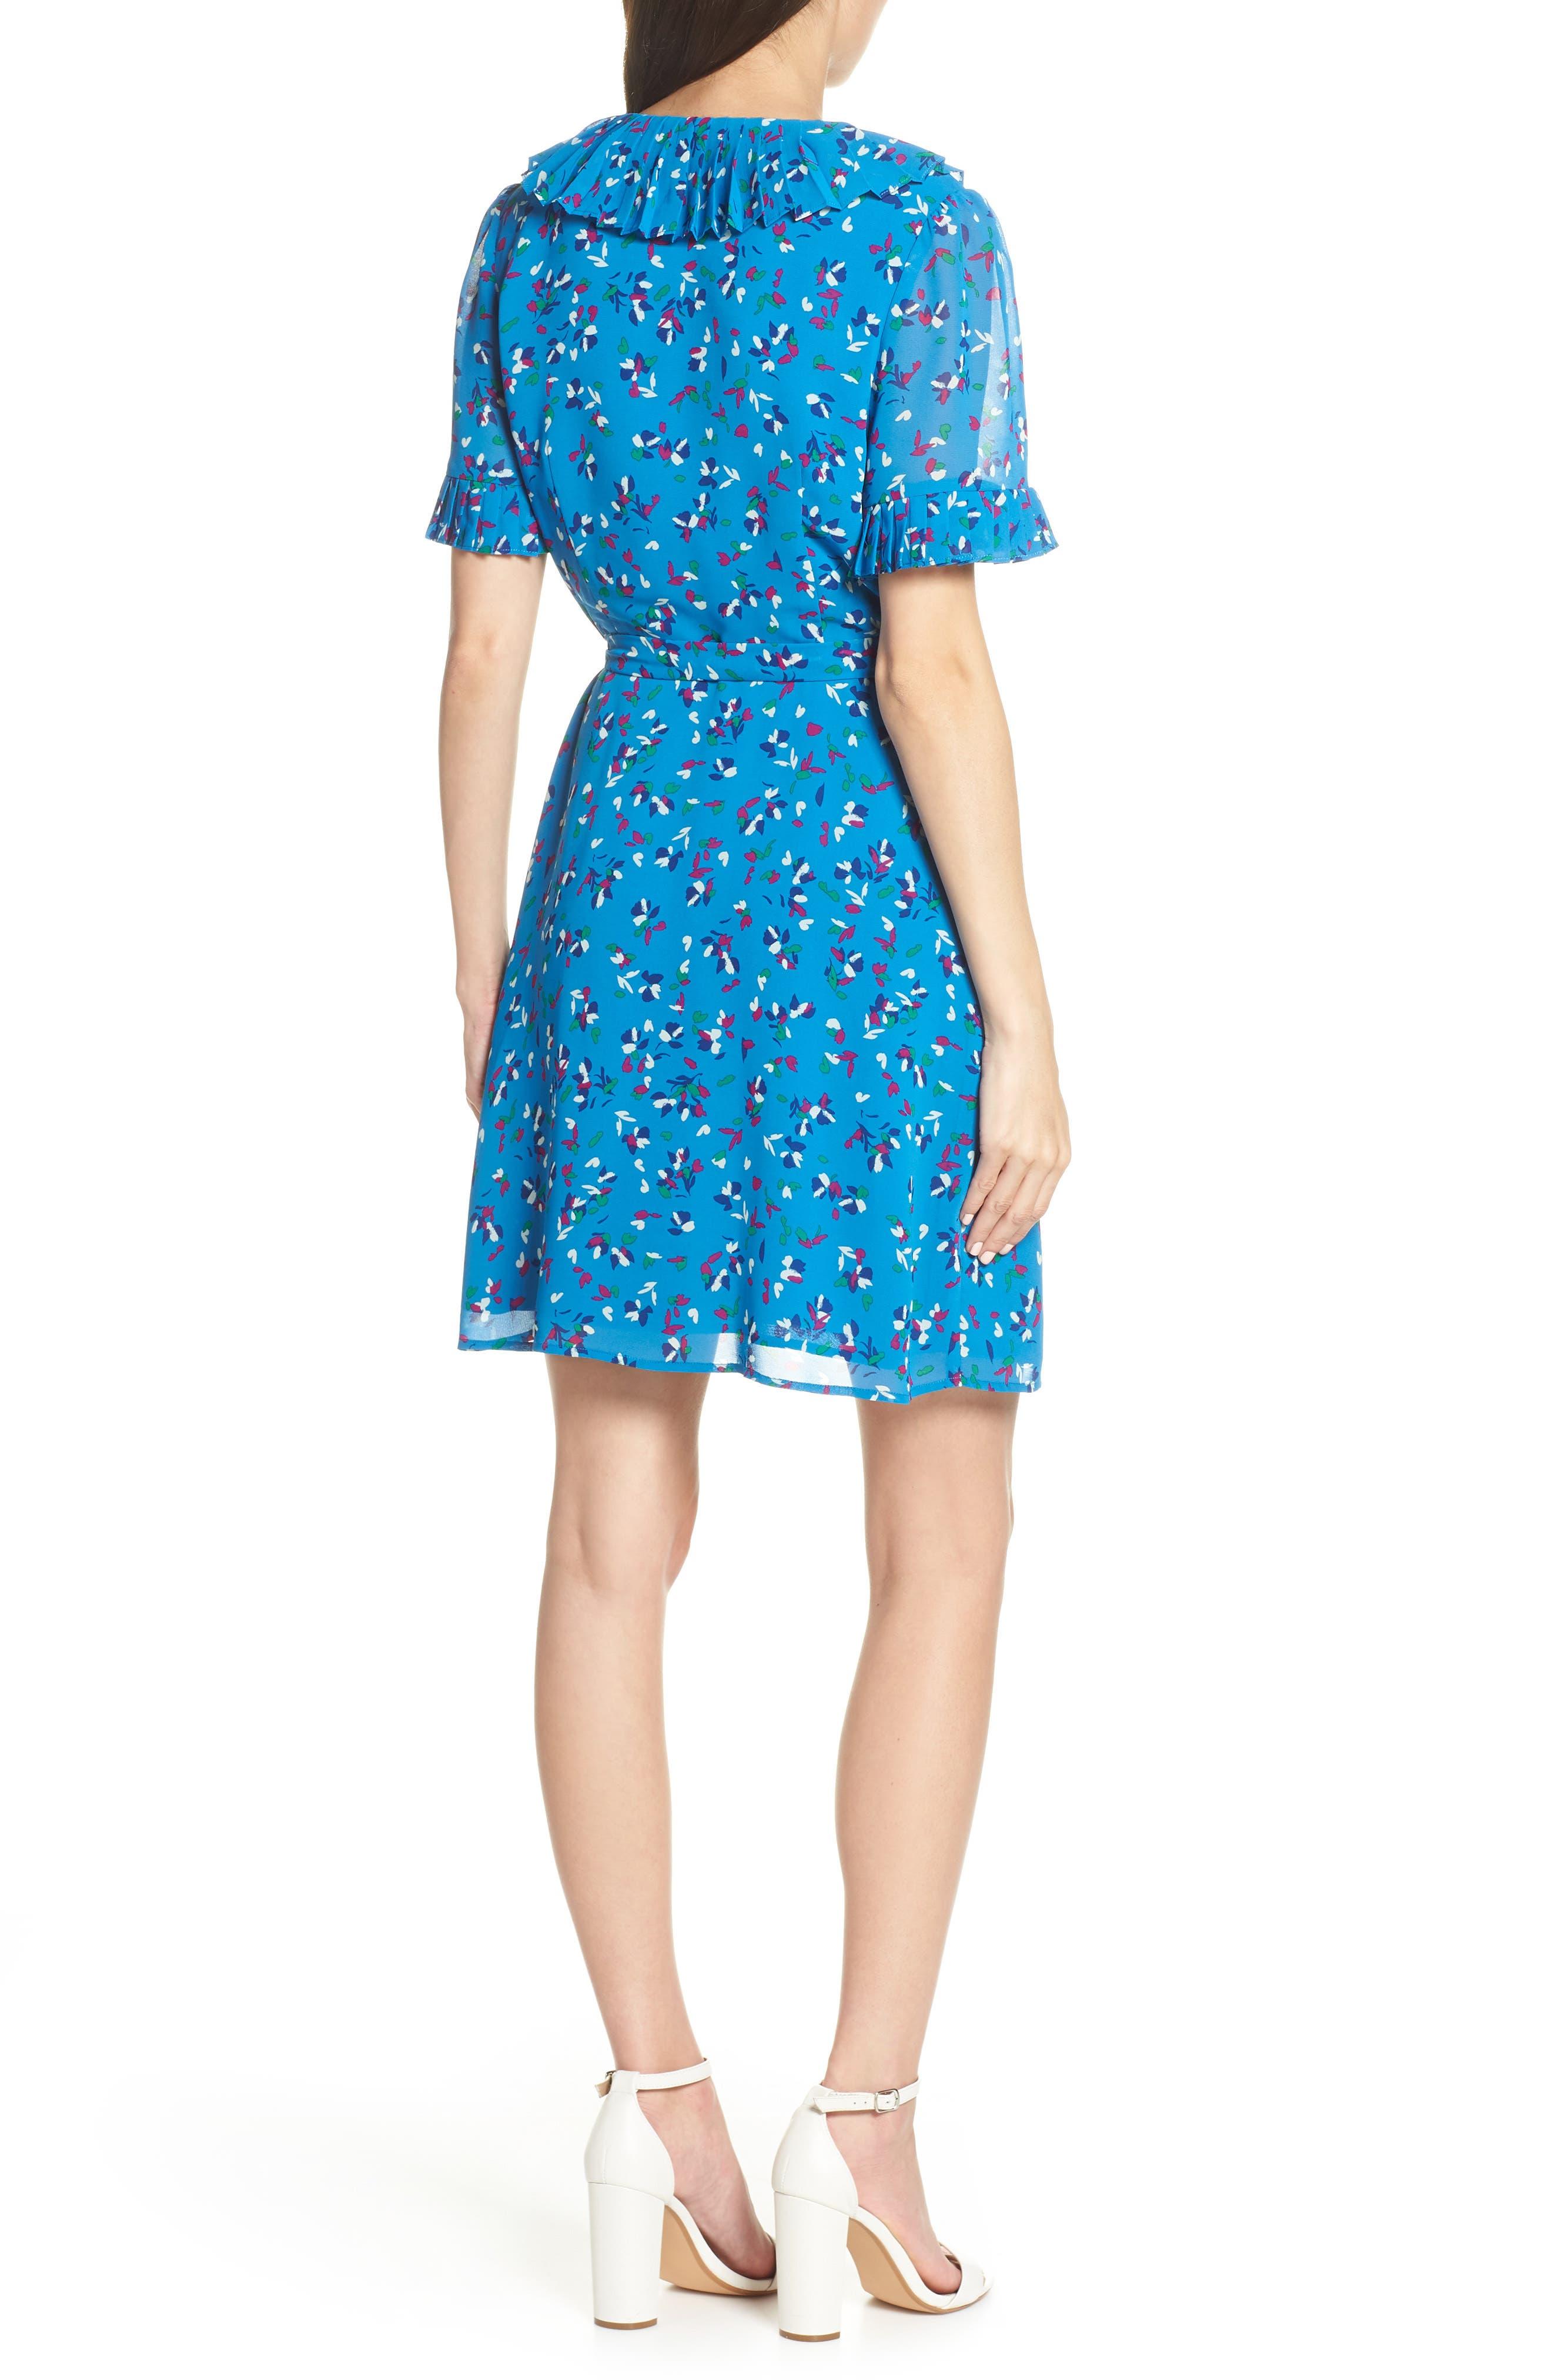 CHARLES HENRY, Pleat Neck Wrap Dress, Alternate thumbnail 4, color, BLUE FLORAL DITZY